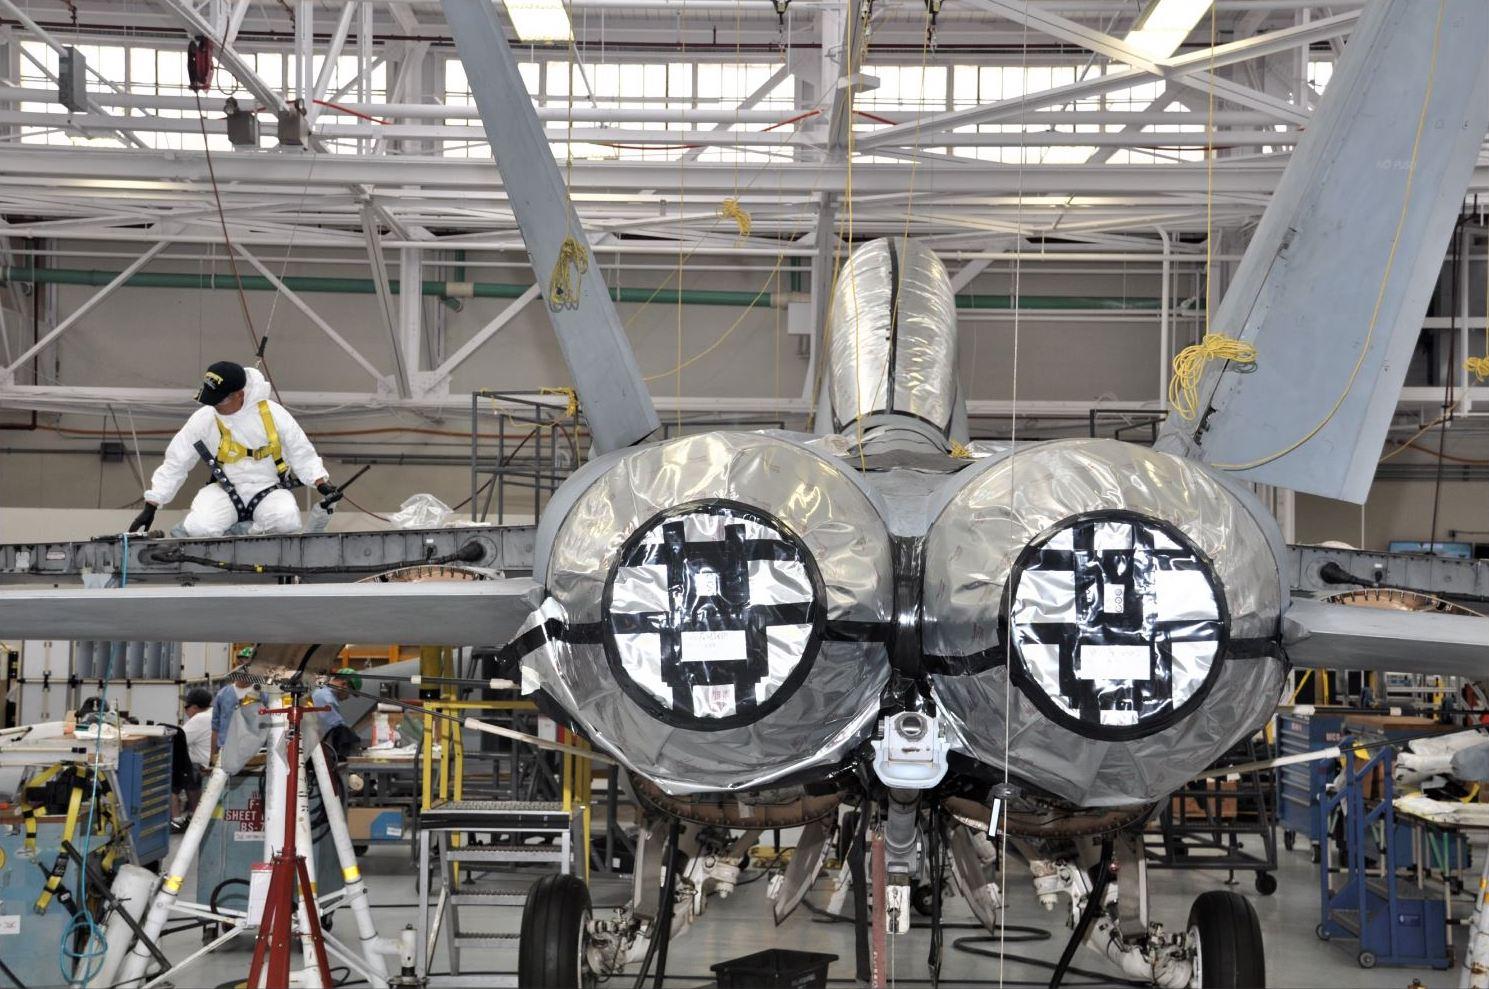 Navy Revamping Aviation Maintenance in New Ten-Year 'FIOP' Plan